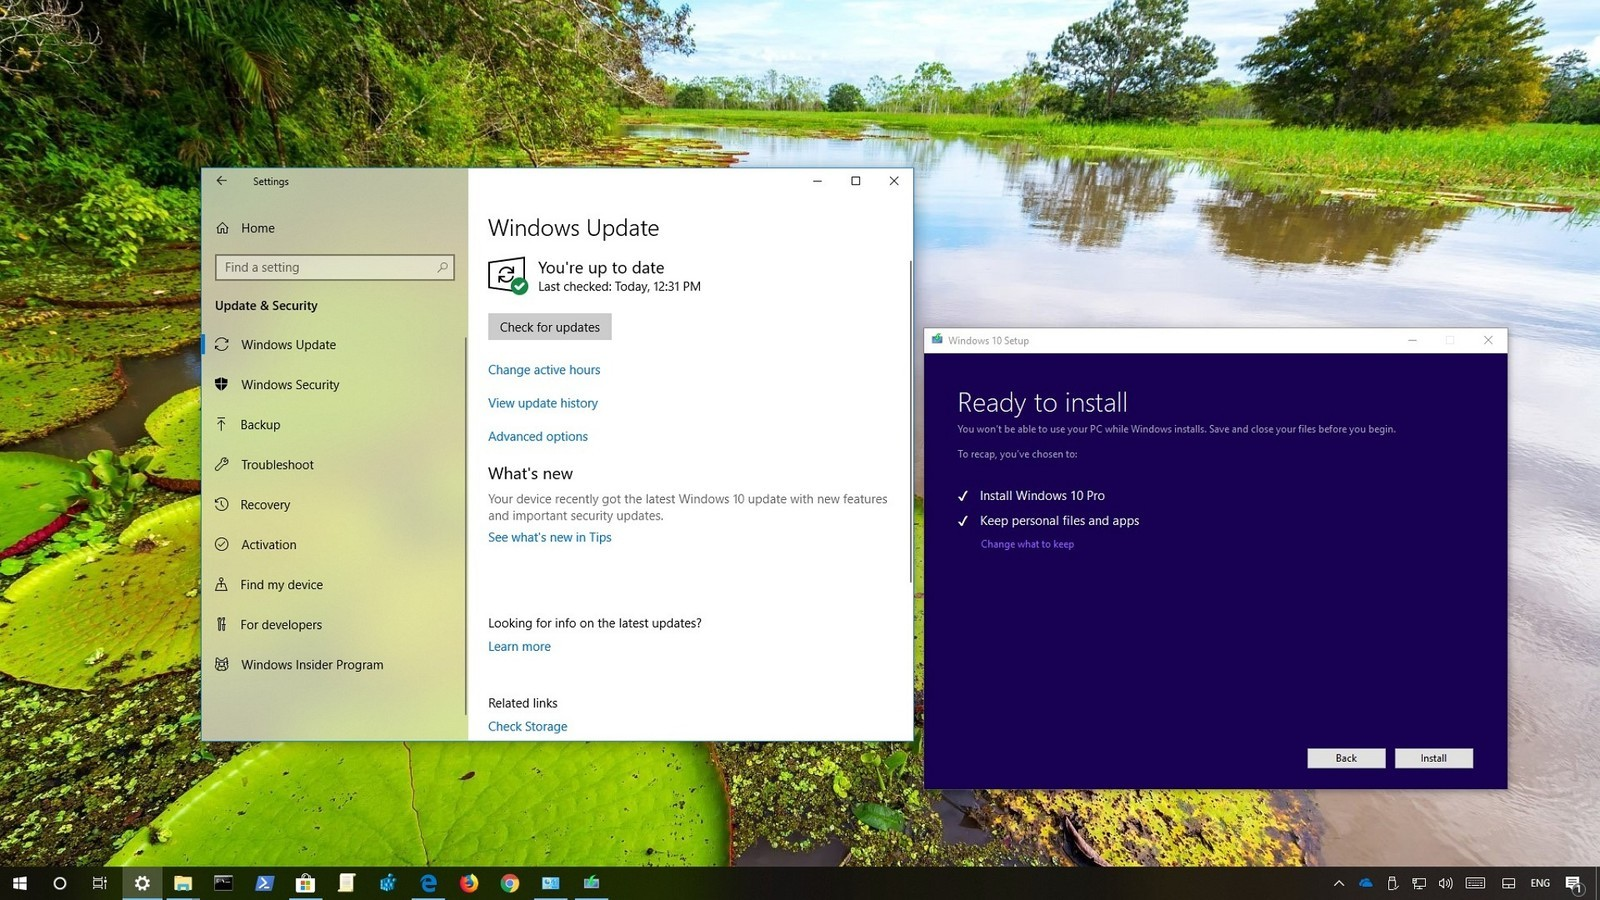 Windows 10 enterprise msdn download | Microsoft makes Windows 10